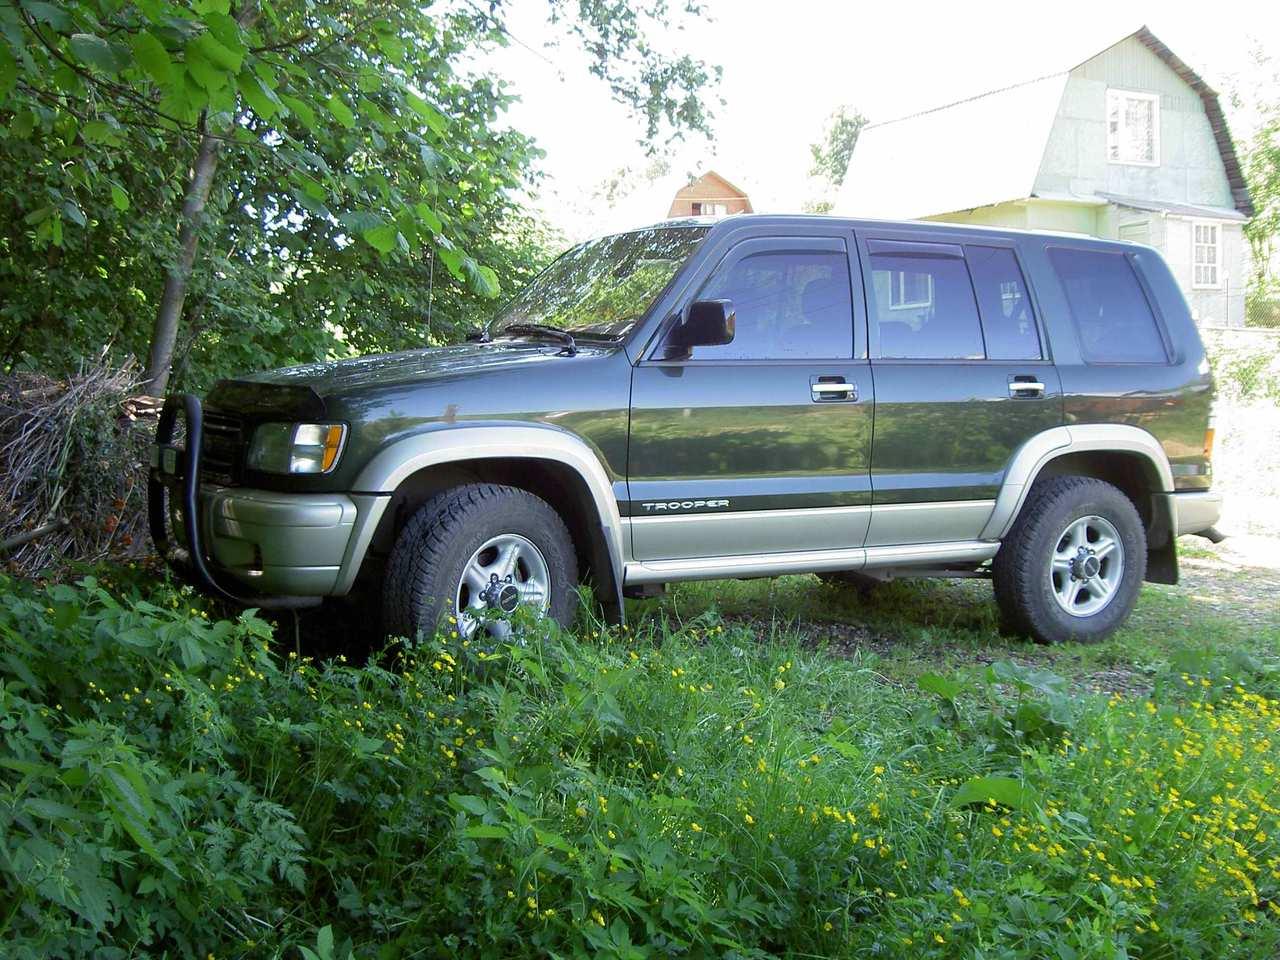 2001 isuzu trooper for sale  3500cc   gasoline  automatic Isuzu 2.8 Turbo Diesel Engine Isuzu 4JB1 Diesel Engine